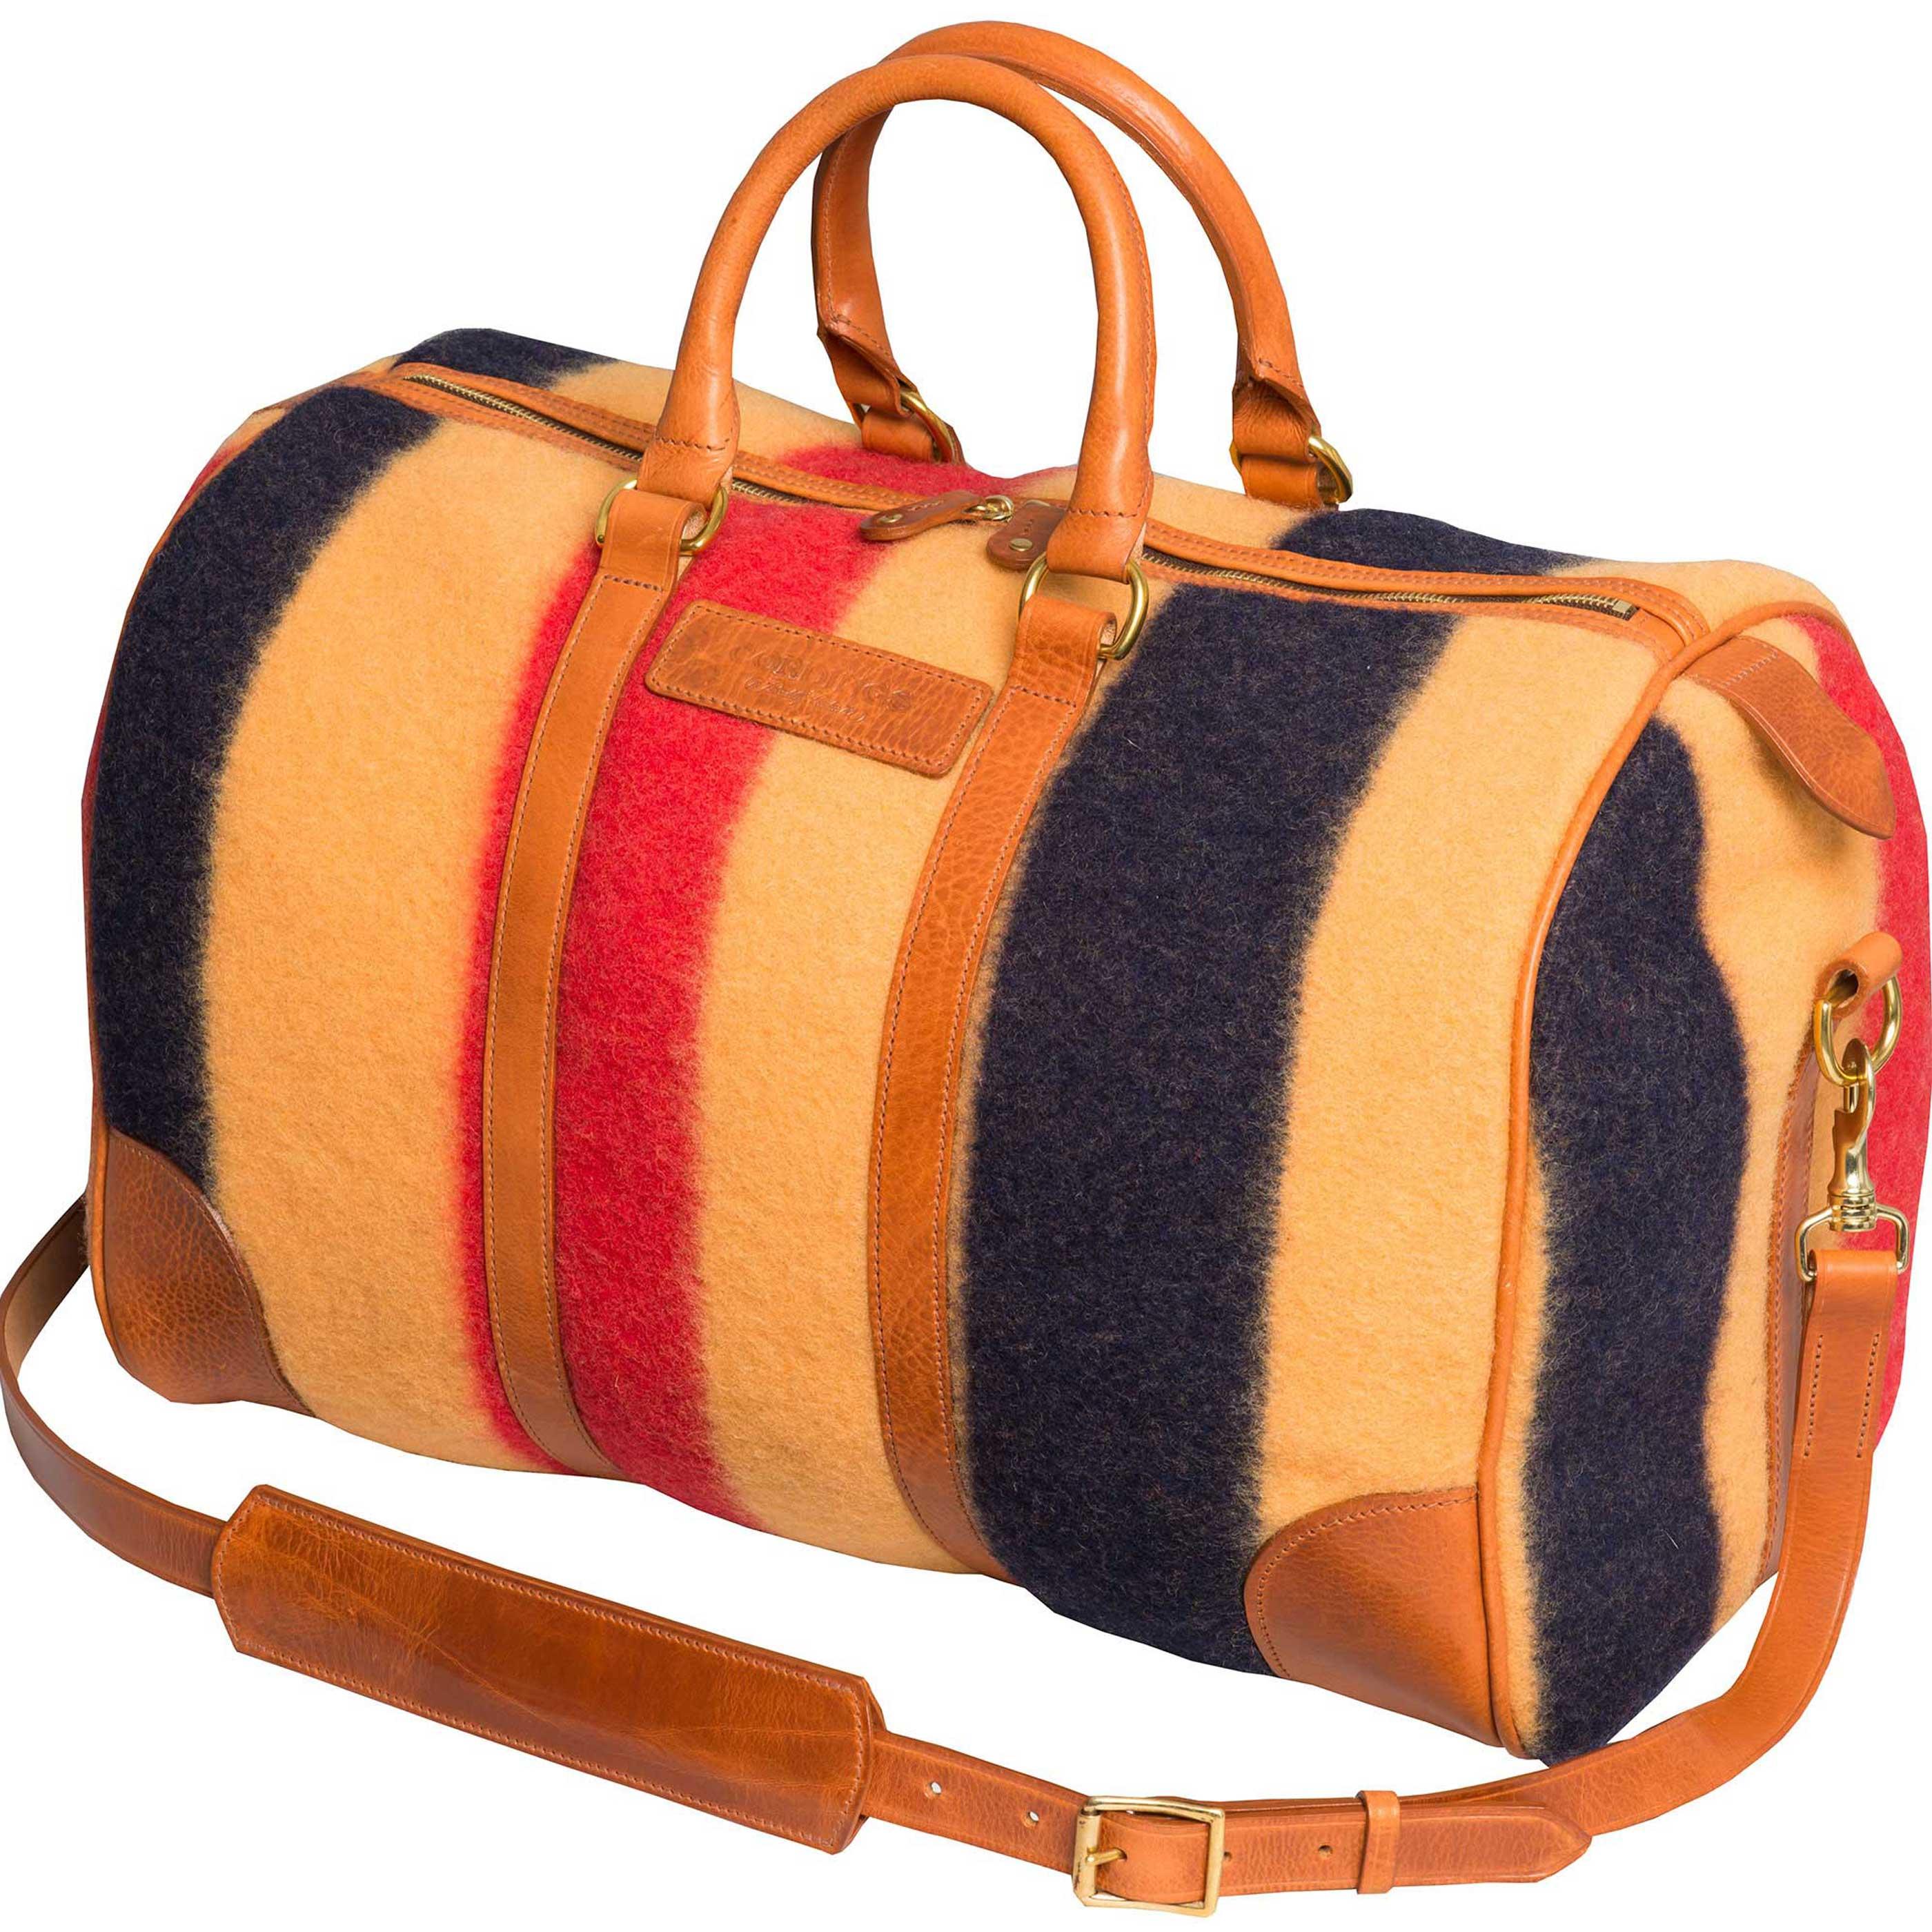 The Witney Boston Bag